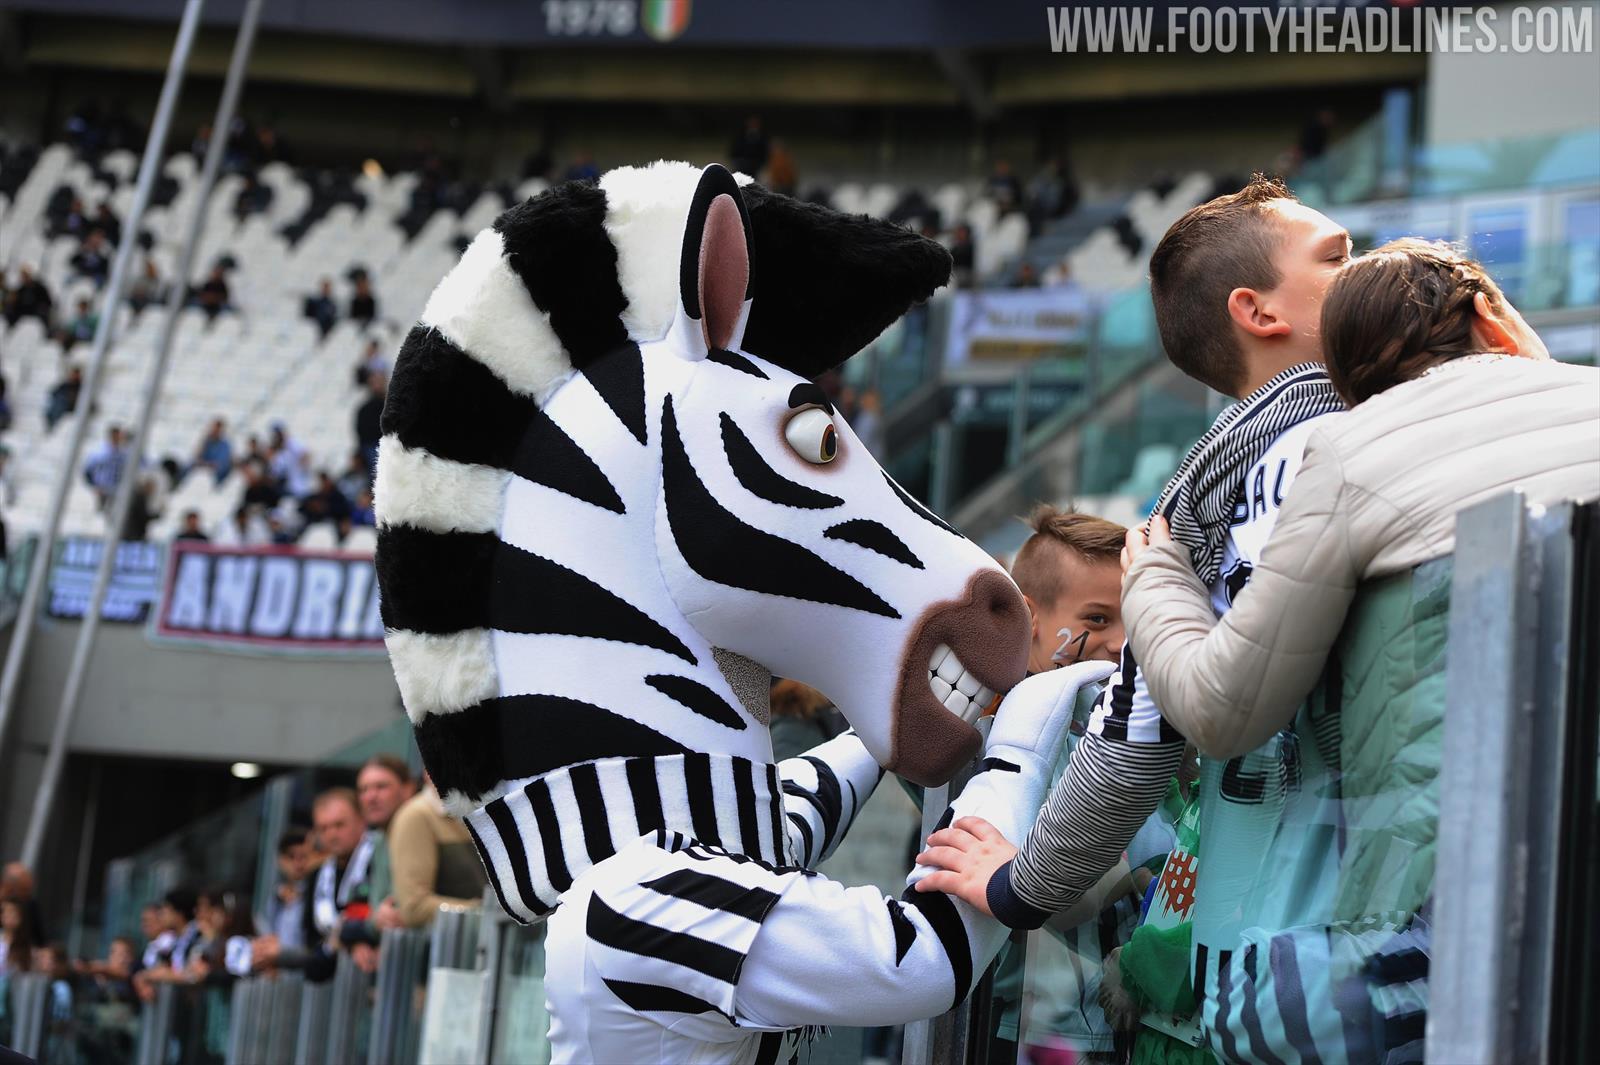 J U V E P I E M O N T E C A L C I O Juventus To Be